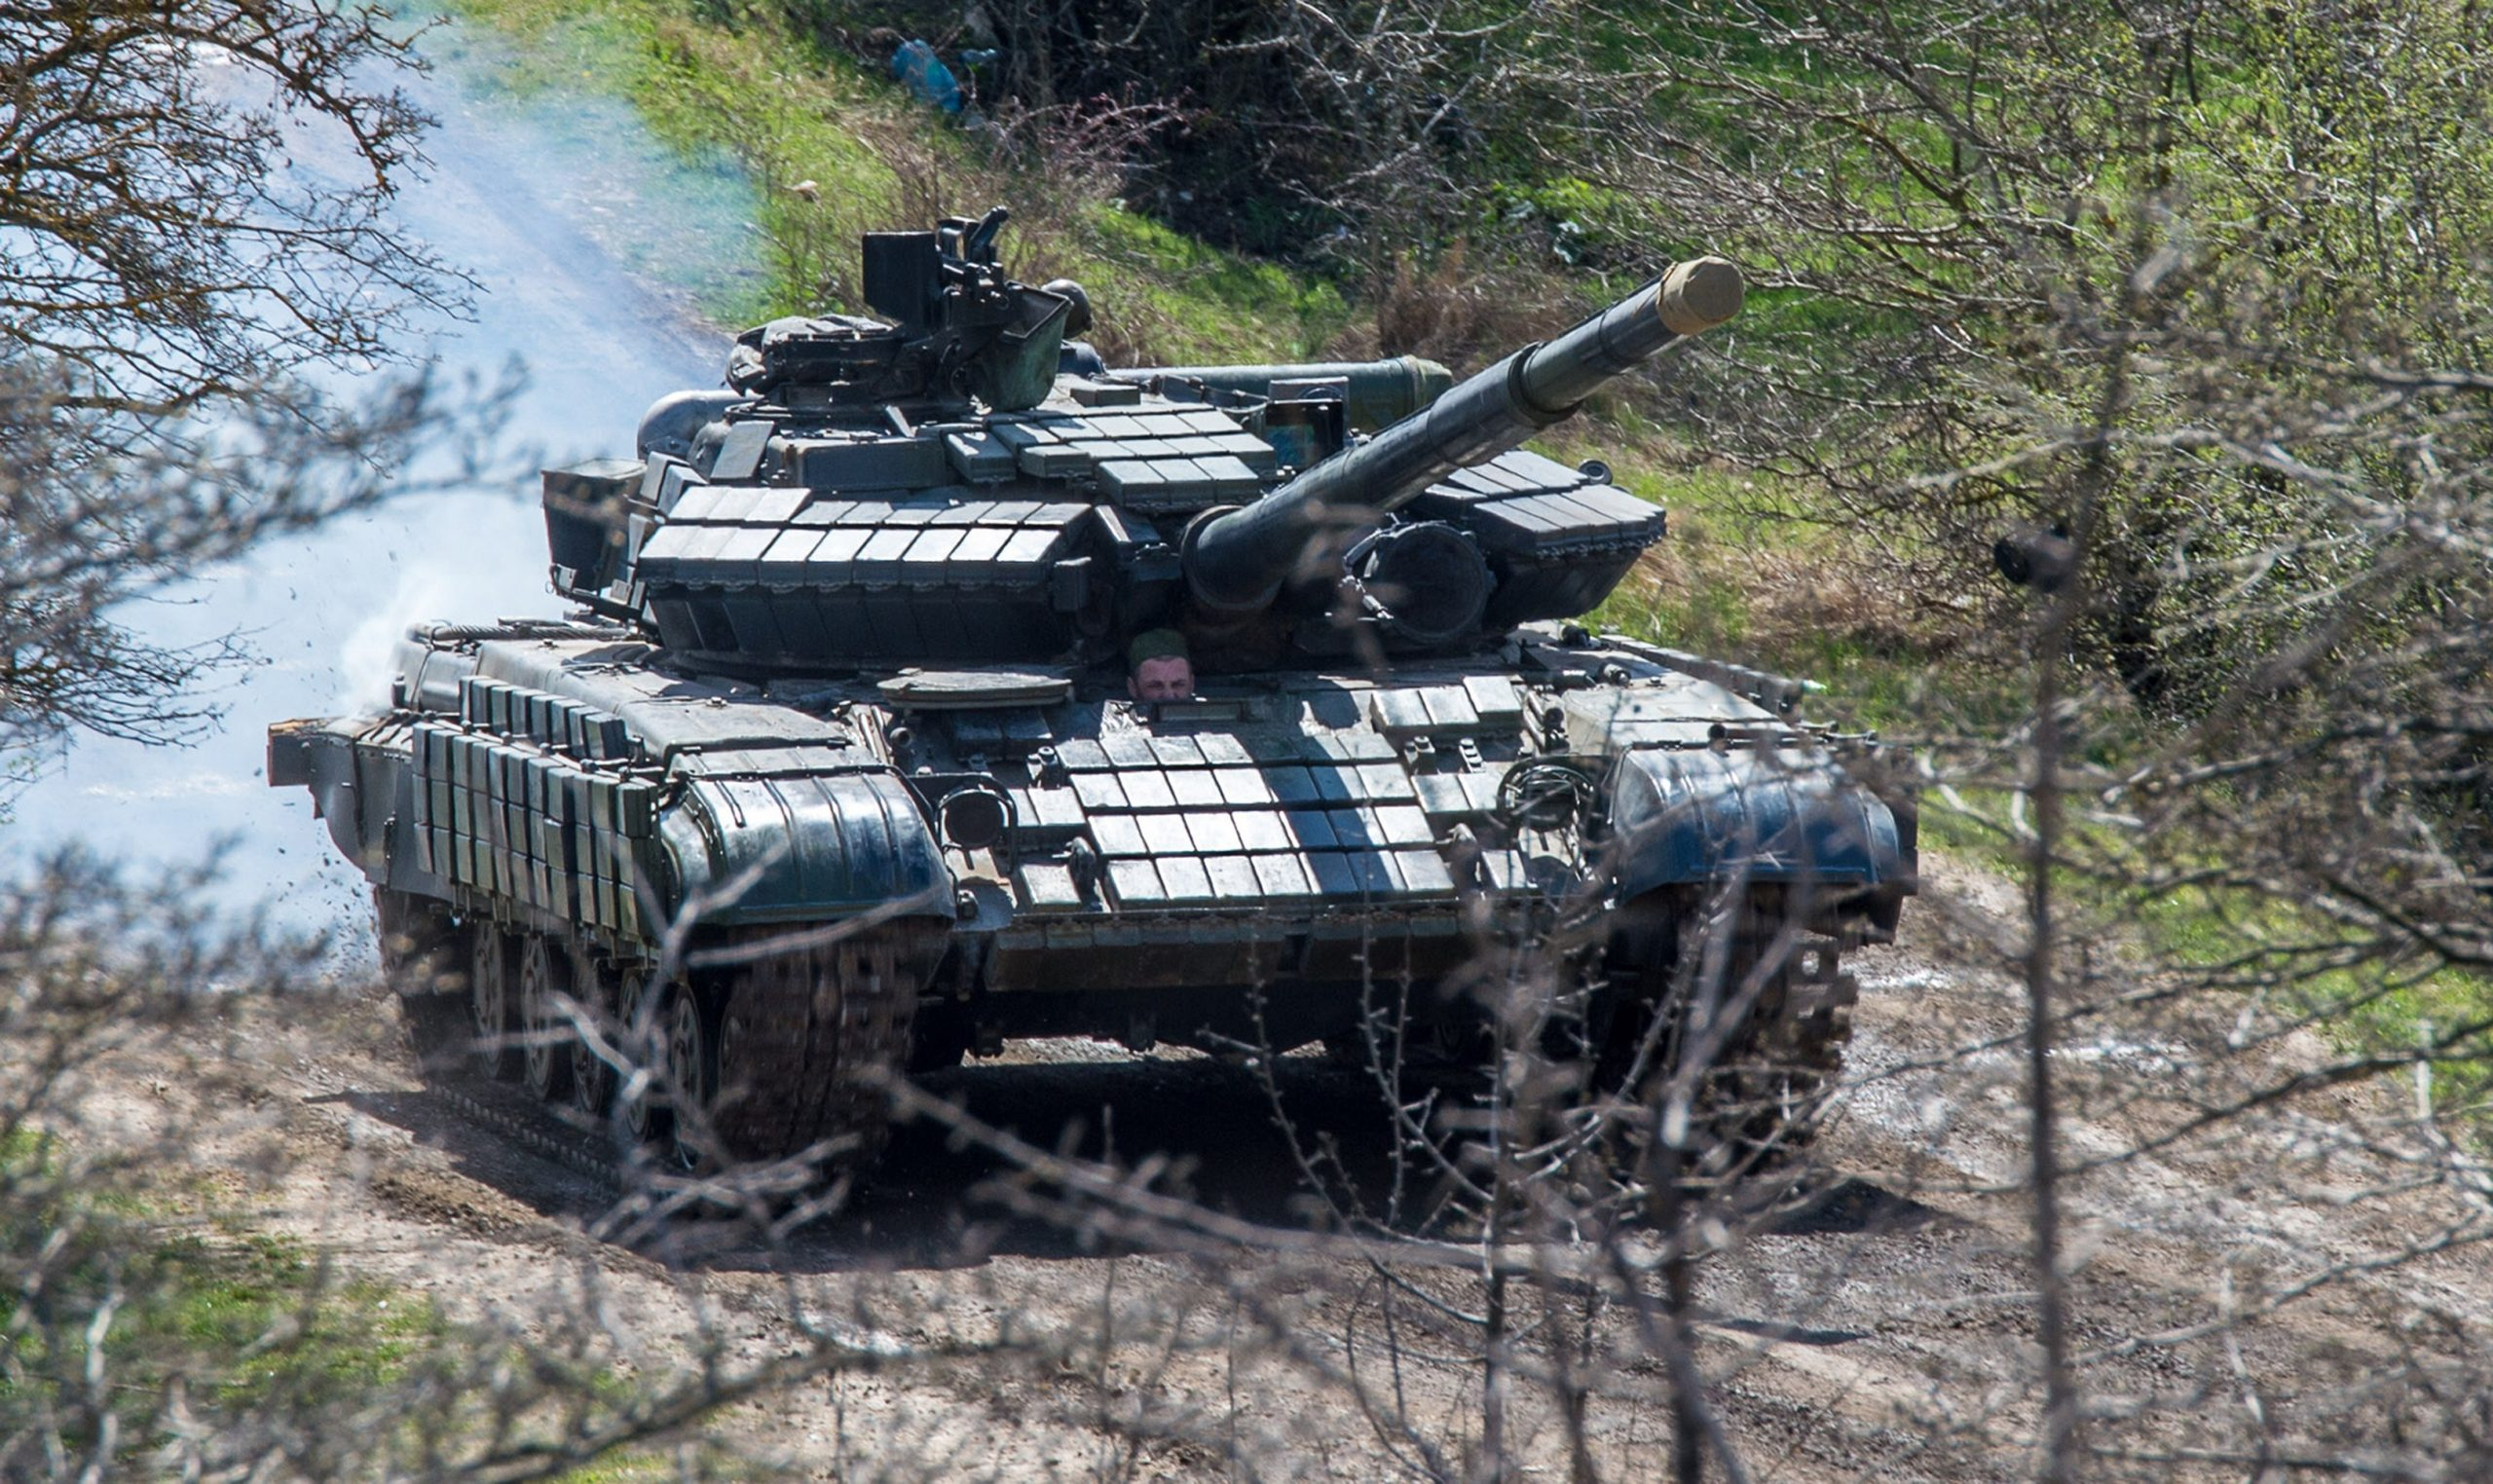 A Russian tank rolls outside a former Ukrainian military base in Perevalnoye, near the Crimean capital Simferopol.